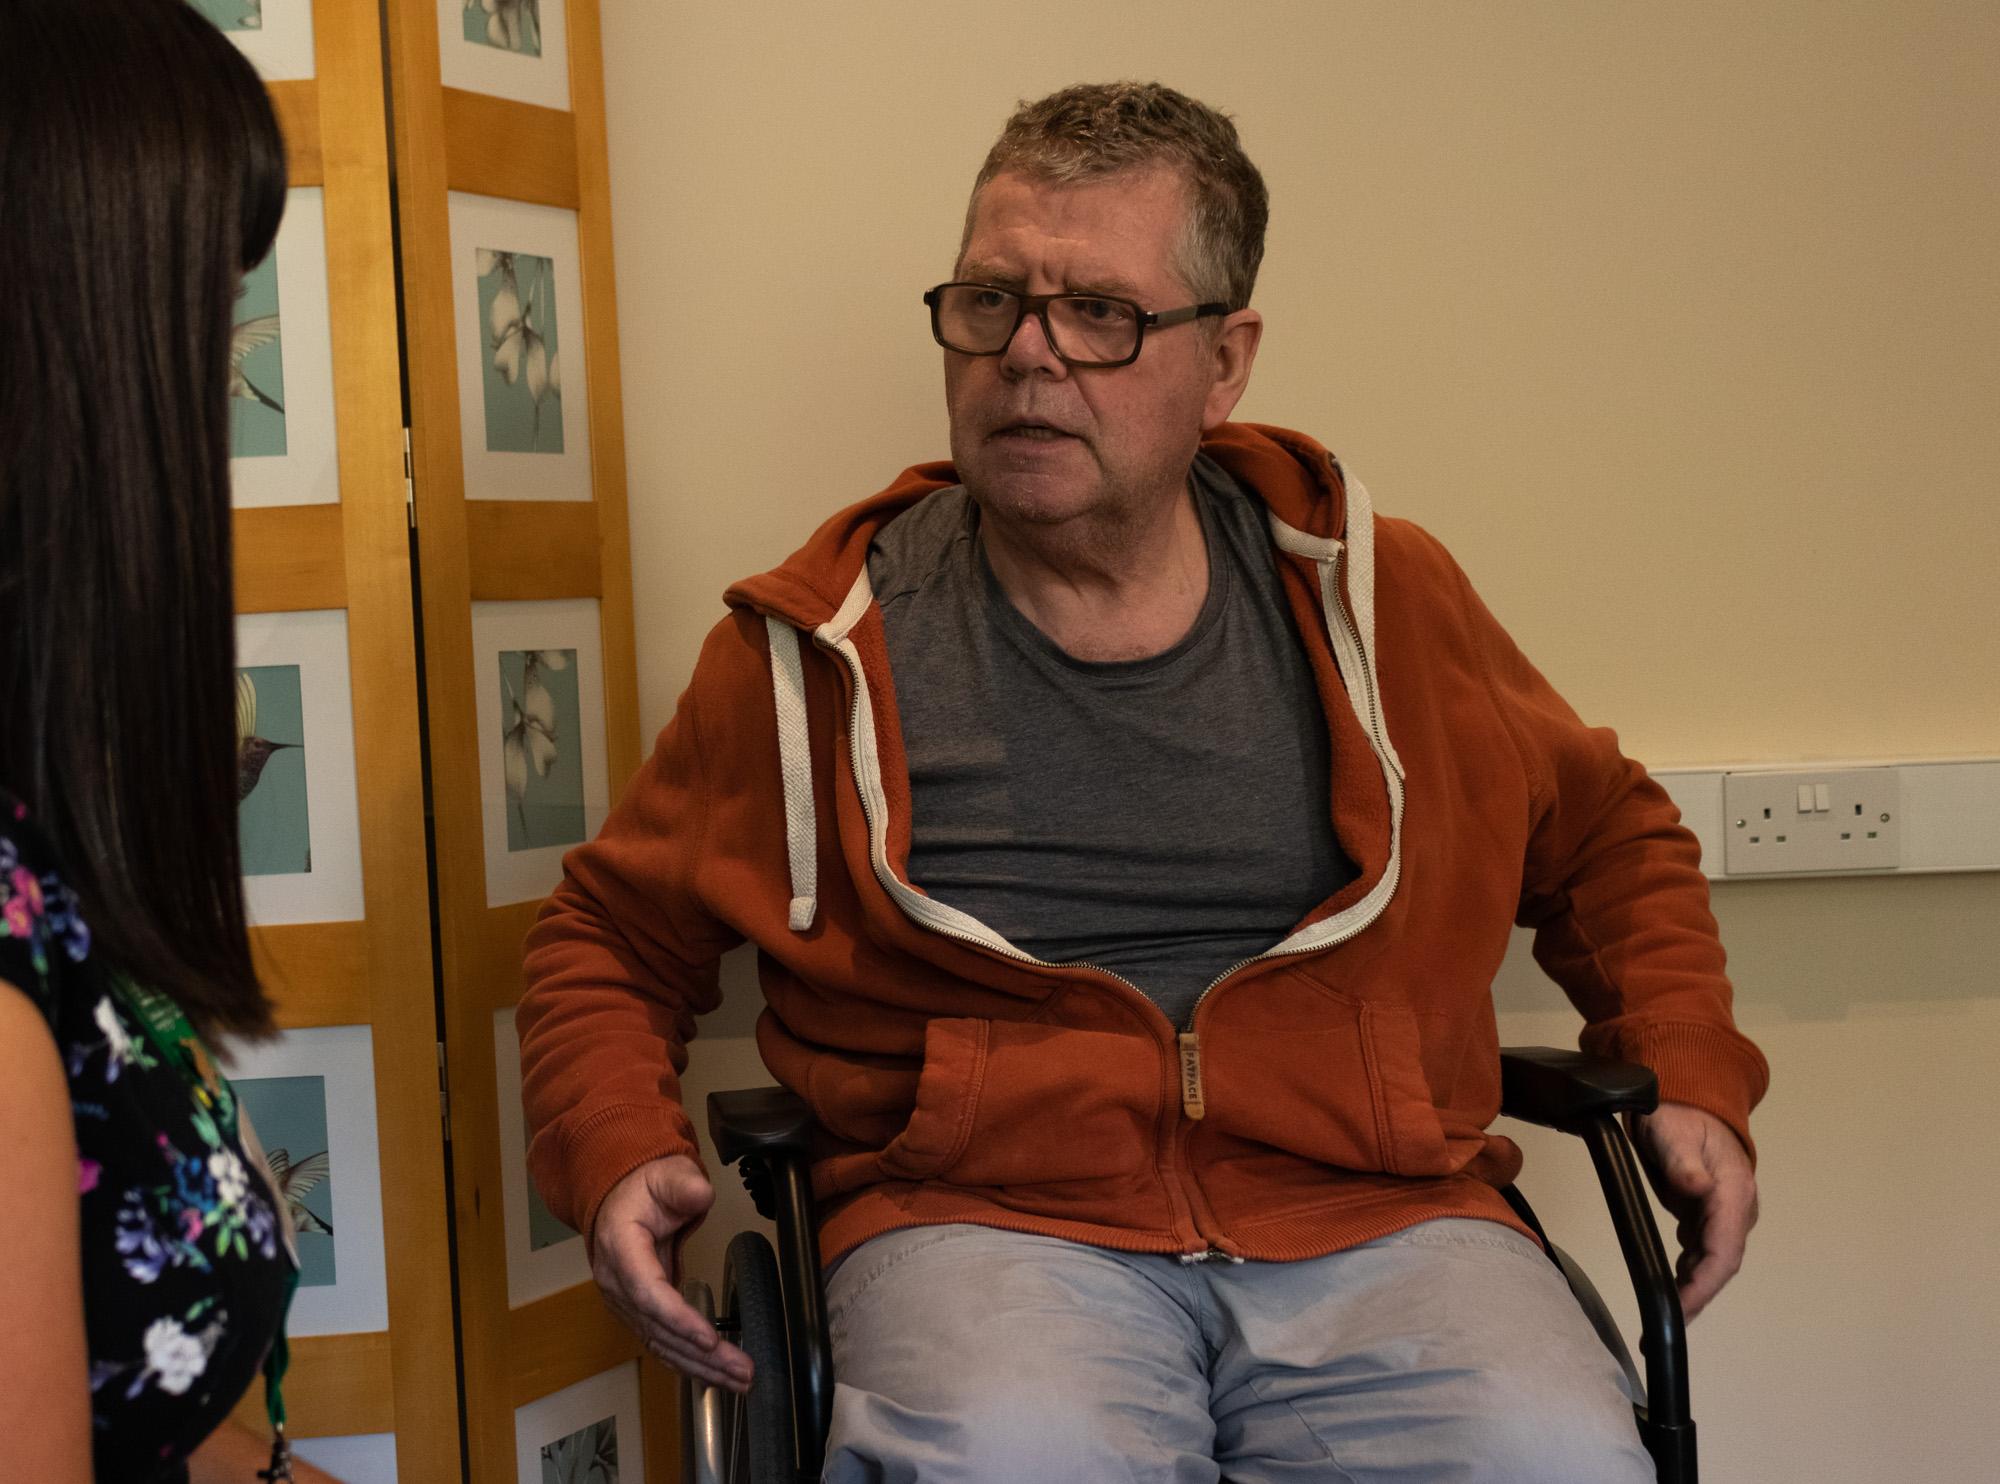 Patient in a wheelchair